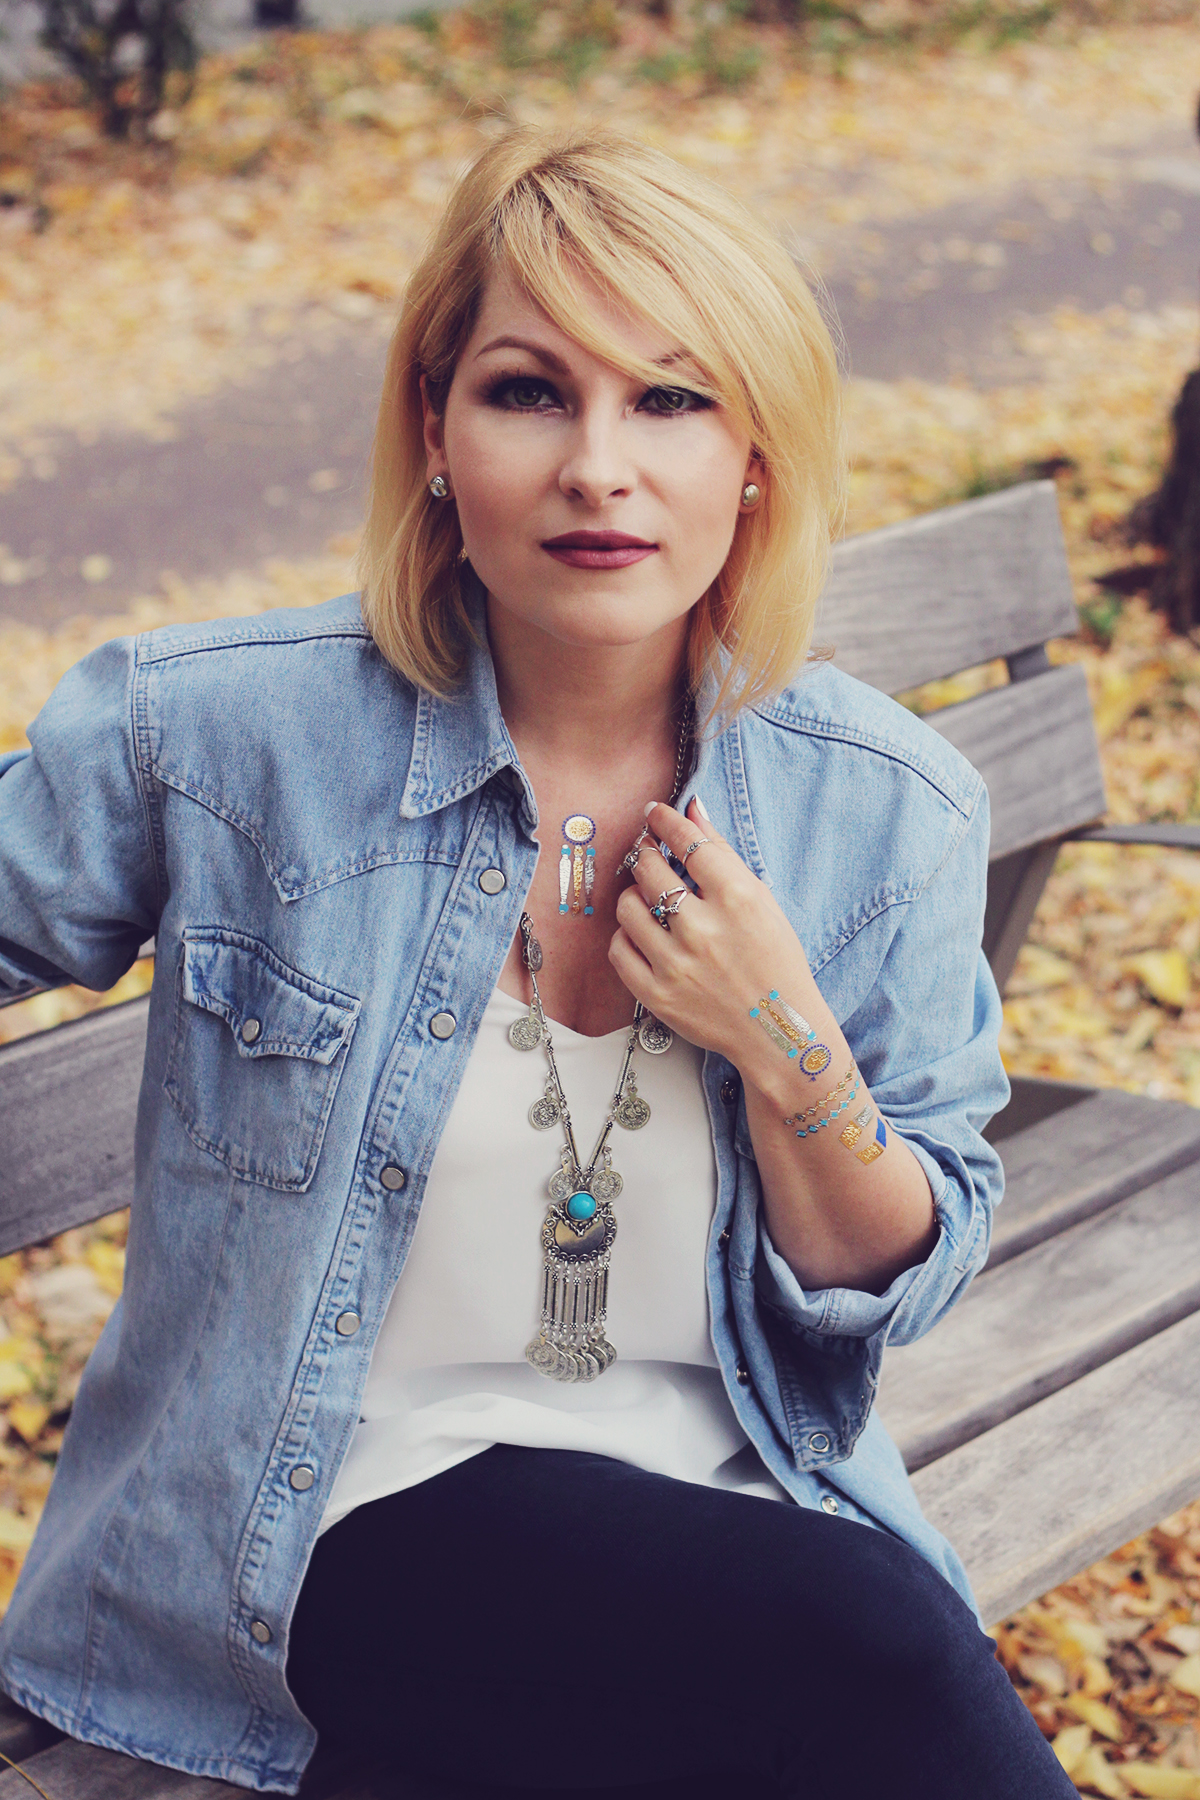 autumn bohemian chic, denim shirt, white top, bohemian necklace, bohemian rings, temporary tattoos, jeans, matte lips